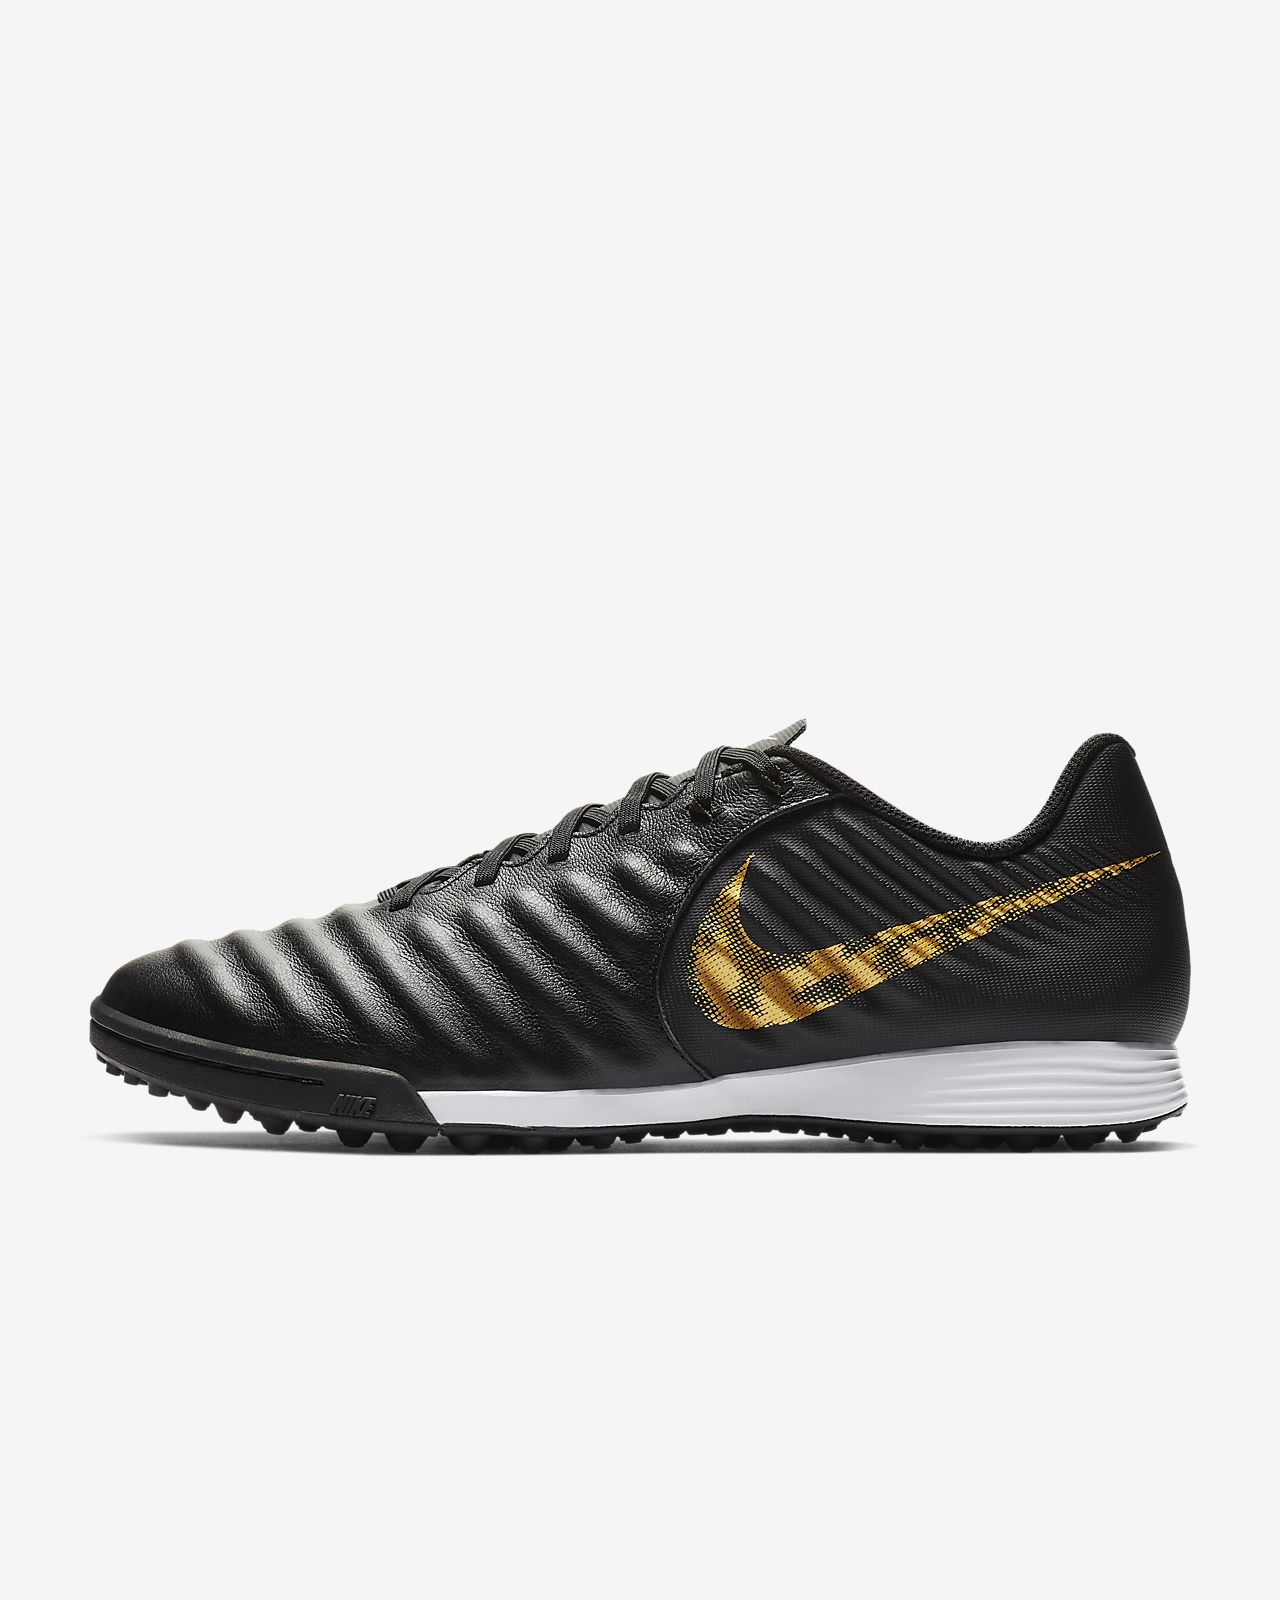 cfb25a0456 Nike LegendX 7 Academy TF Artificial-Turf Football Boot. Nike.com GB